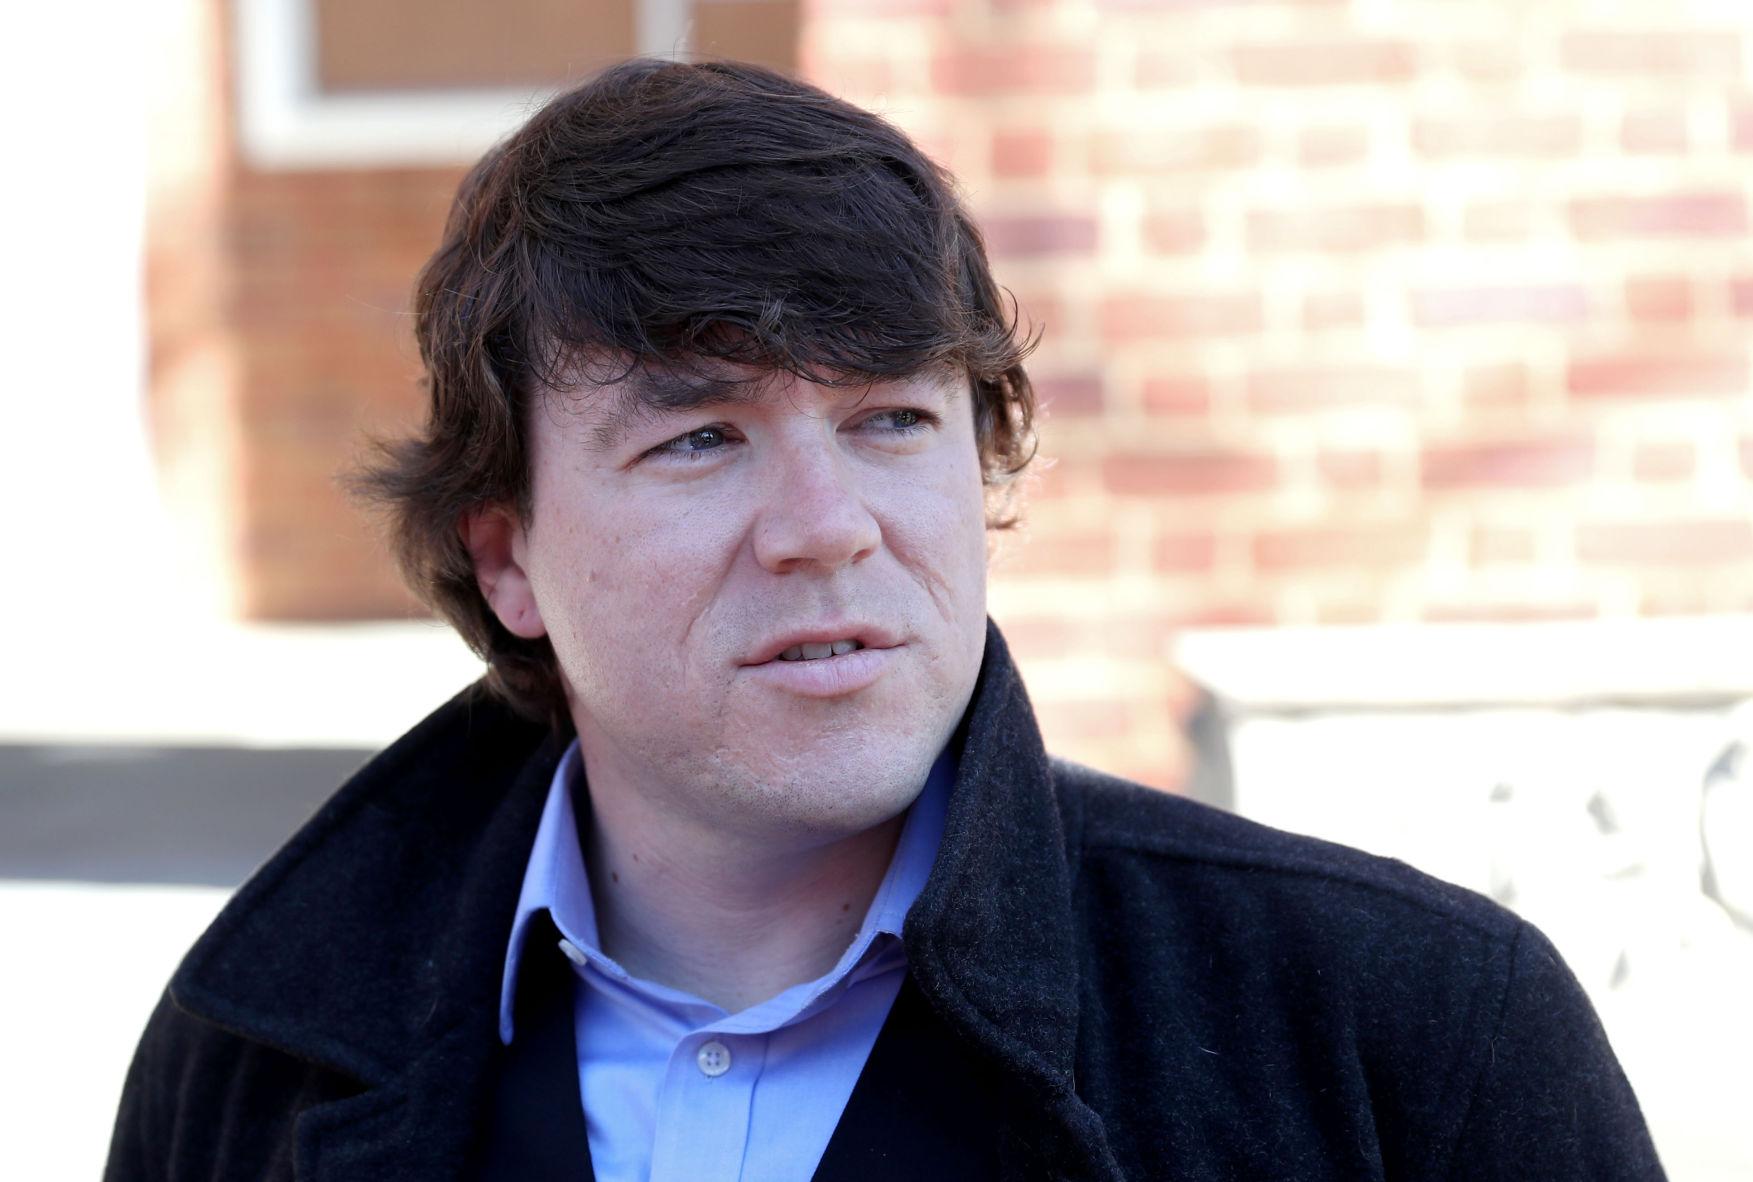 Kessler released on bond on perjury charge